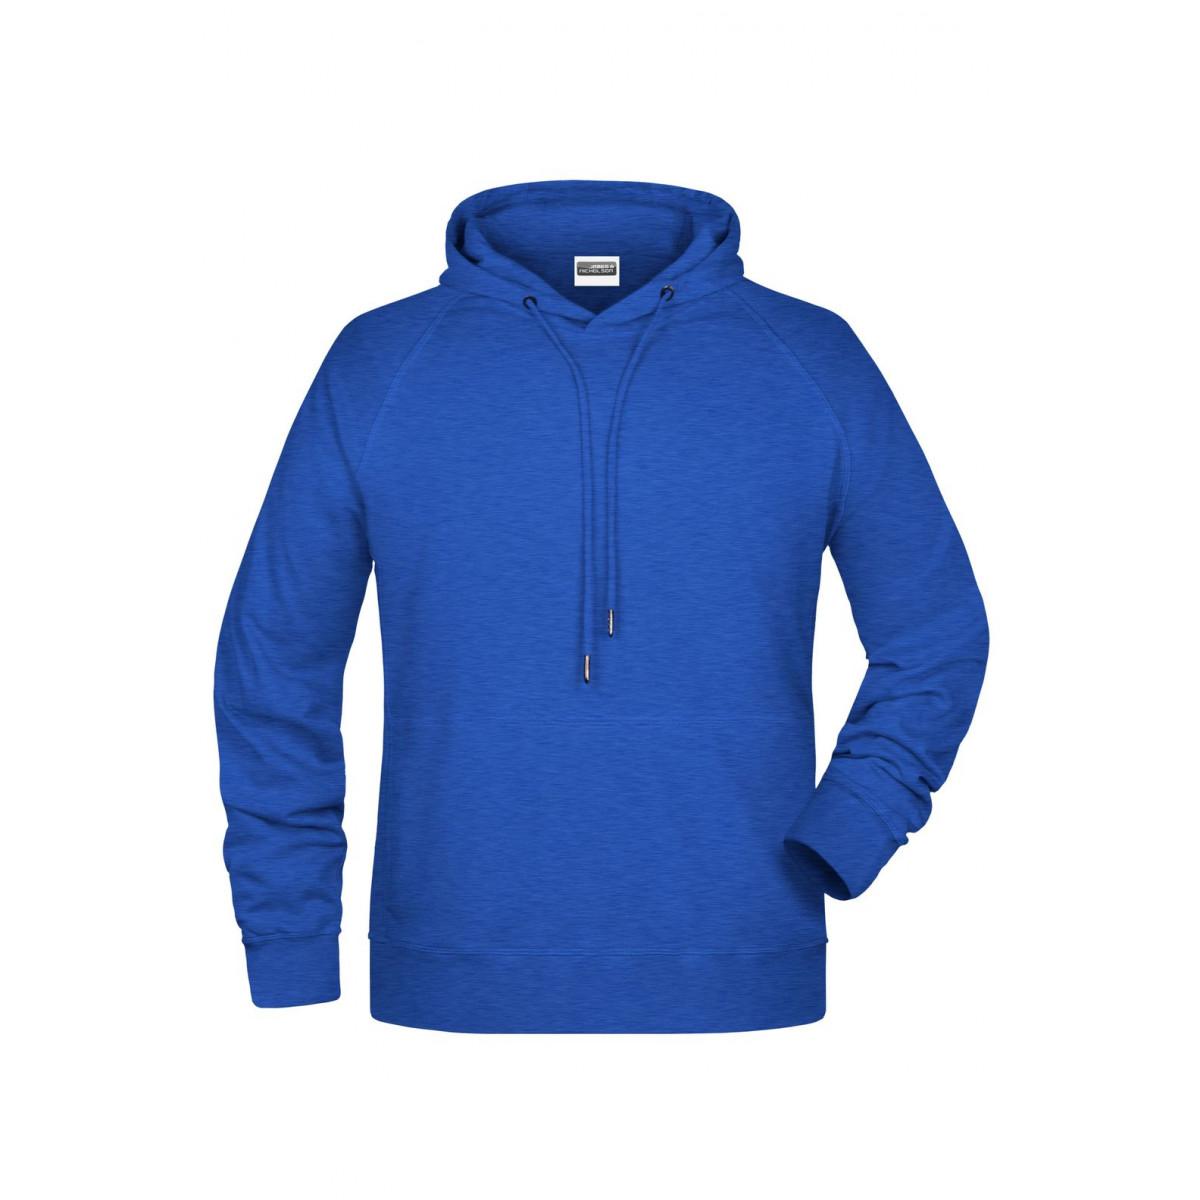 Толстовка мужская 8024 Mens Hoody - Ярко-синий меоанж